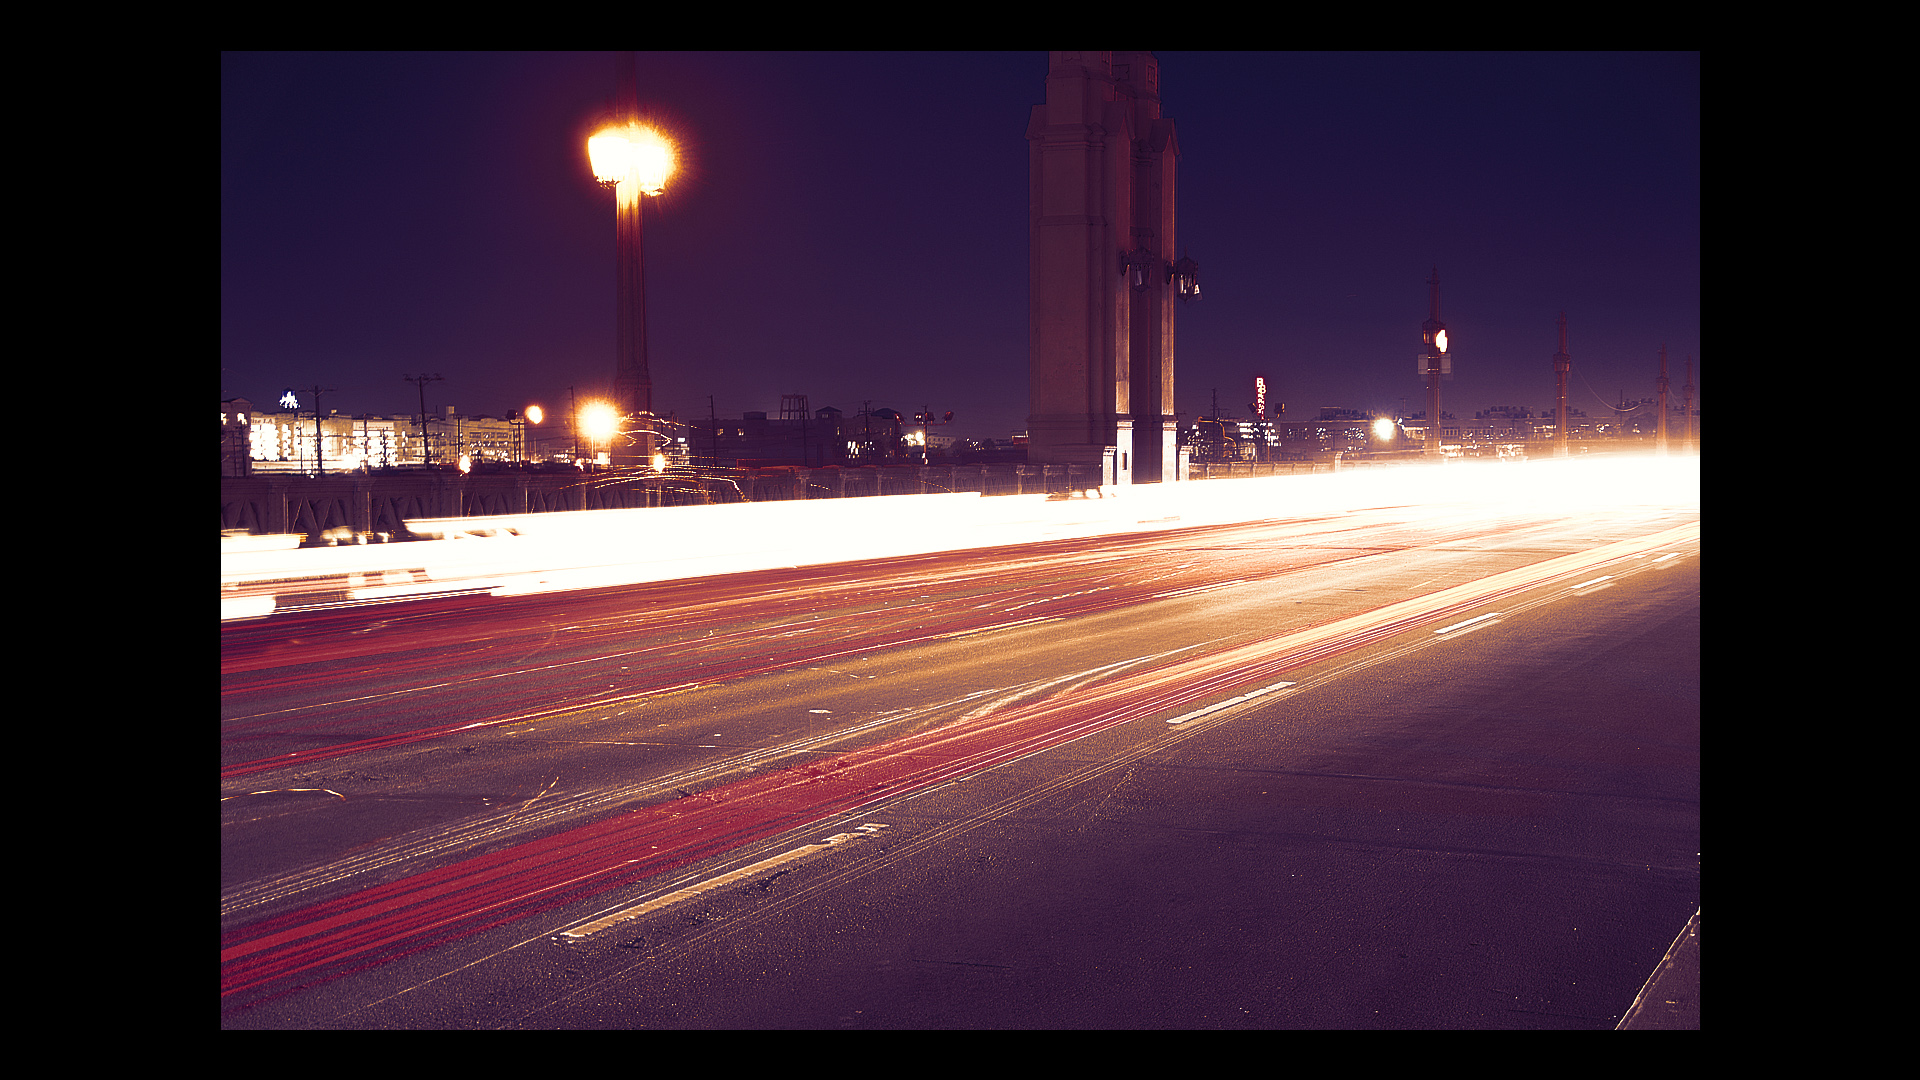 2015, Passing Lights, Nikon D7200